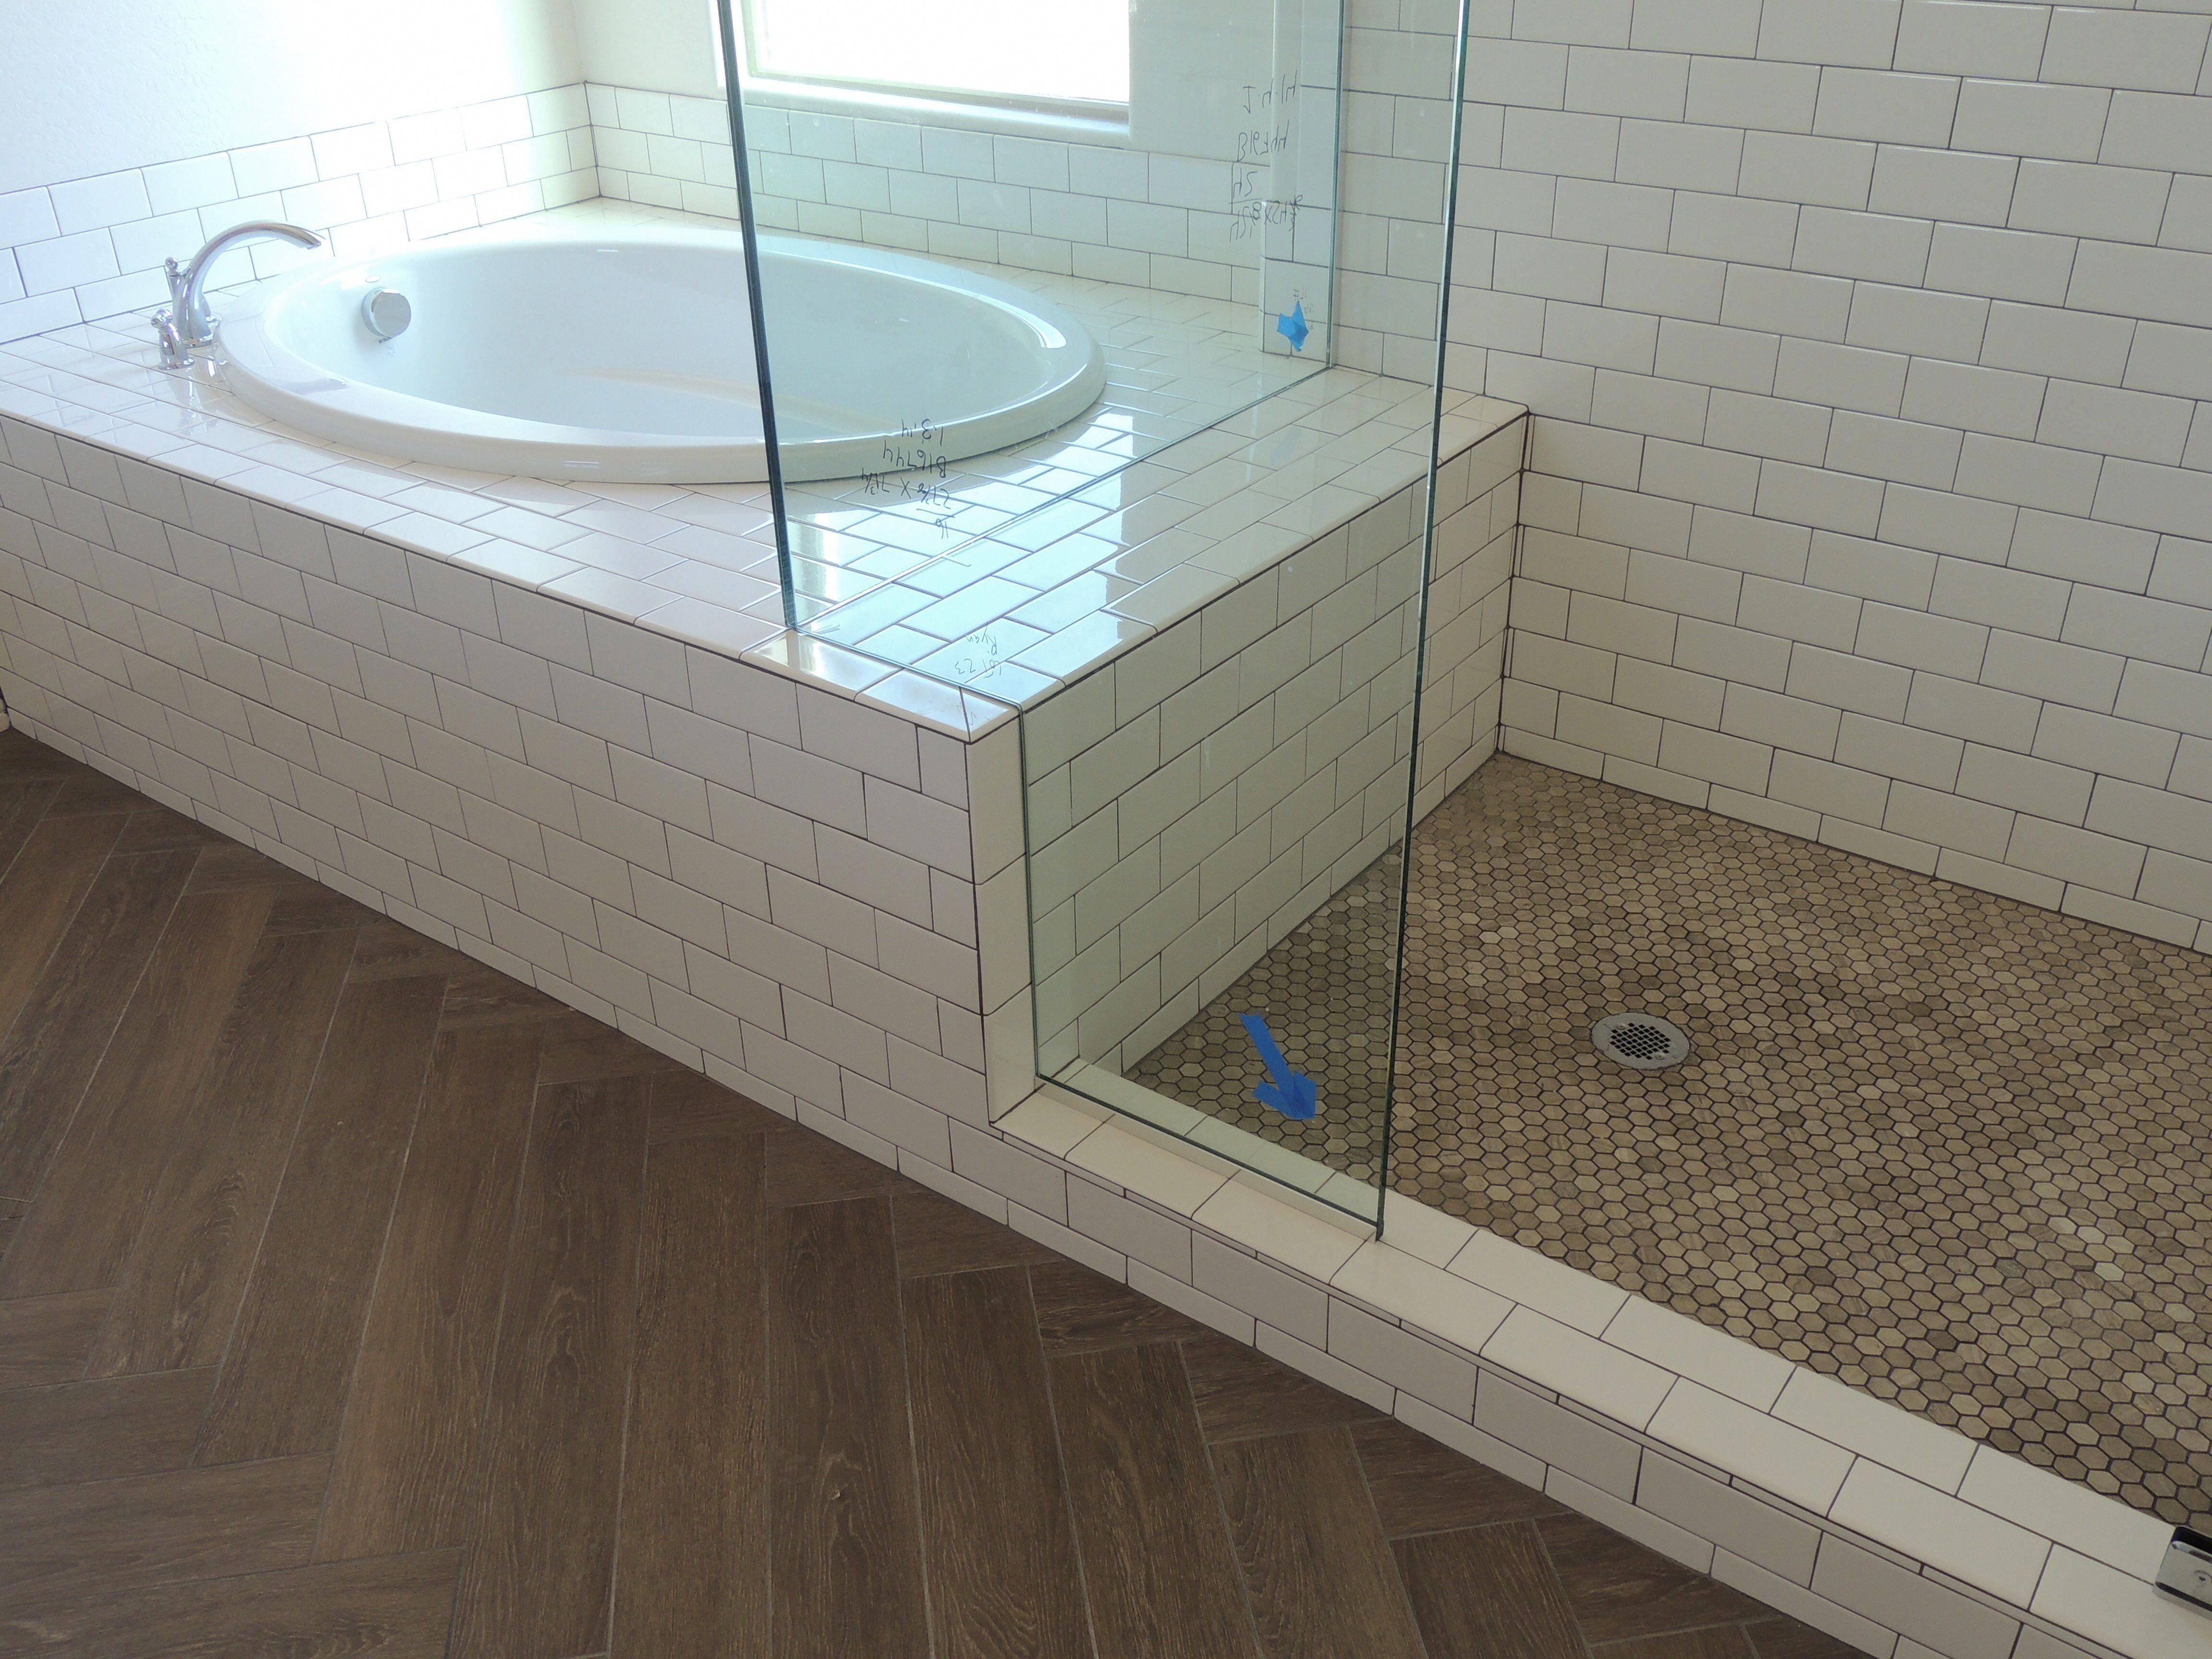 Chevron Herringbone Faux Wood Floor Tile Brown Gray White Subway Tile Tub And Shower Surround With Gray Grout Ba Faux Wood Tiles Wood Tile Bathroom Wood Tile